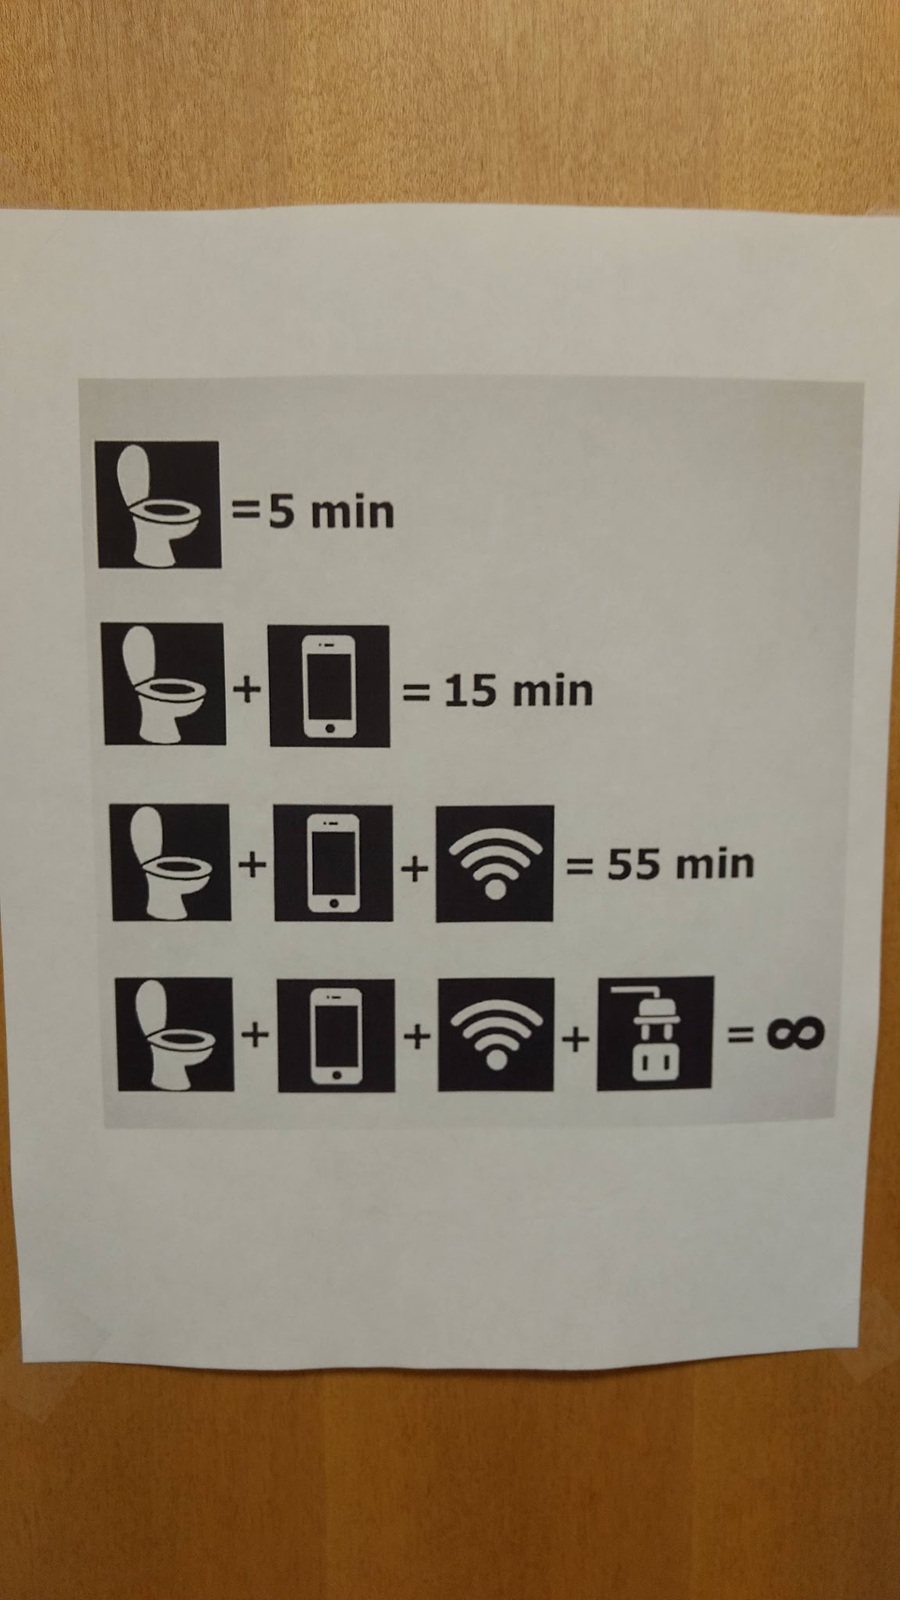 Lokus + Handy + Wi-Fi + Ladegerät = Langes Geschäft.